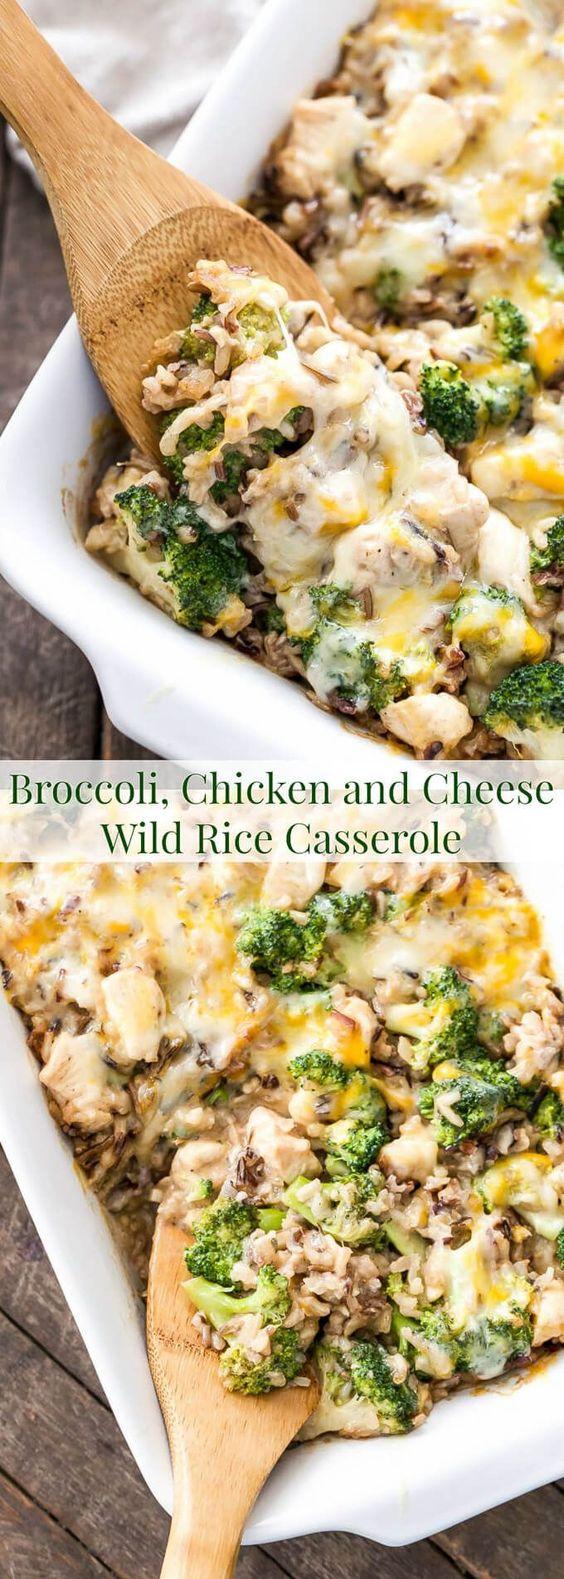 BROCCOLI, CHICKEN AND CHEESE WILD RICE CASSEROLE